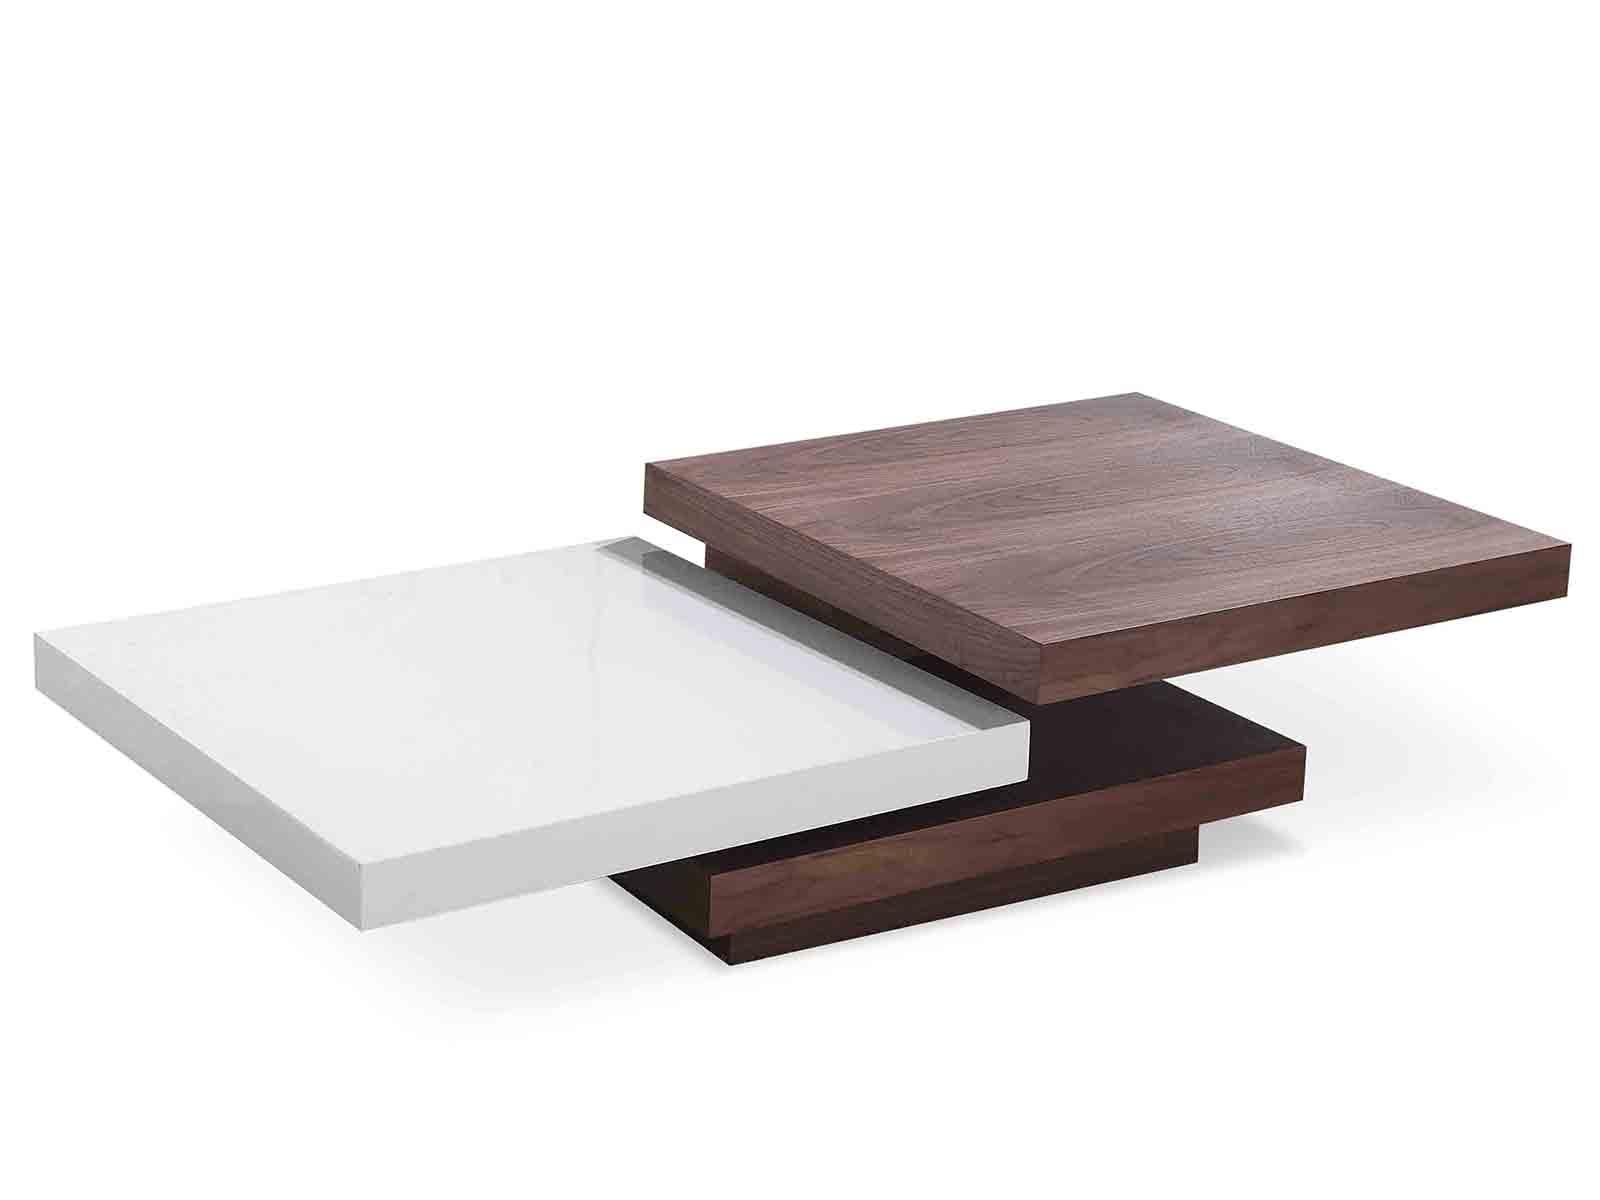 Sleek Designer Living Room Coffee Table